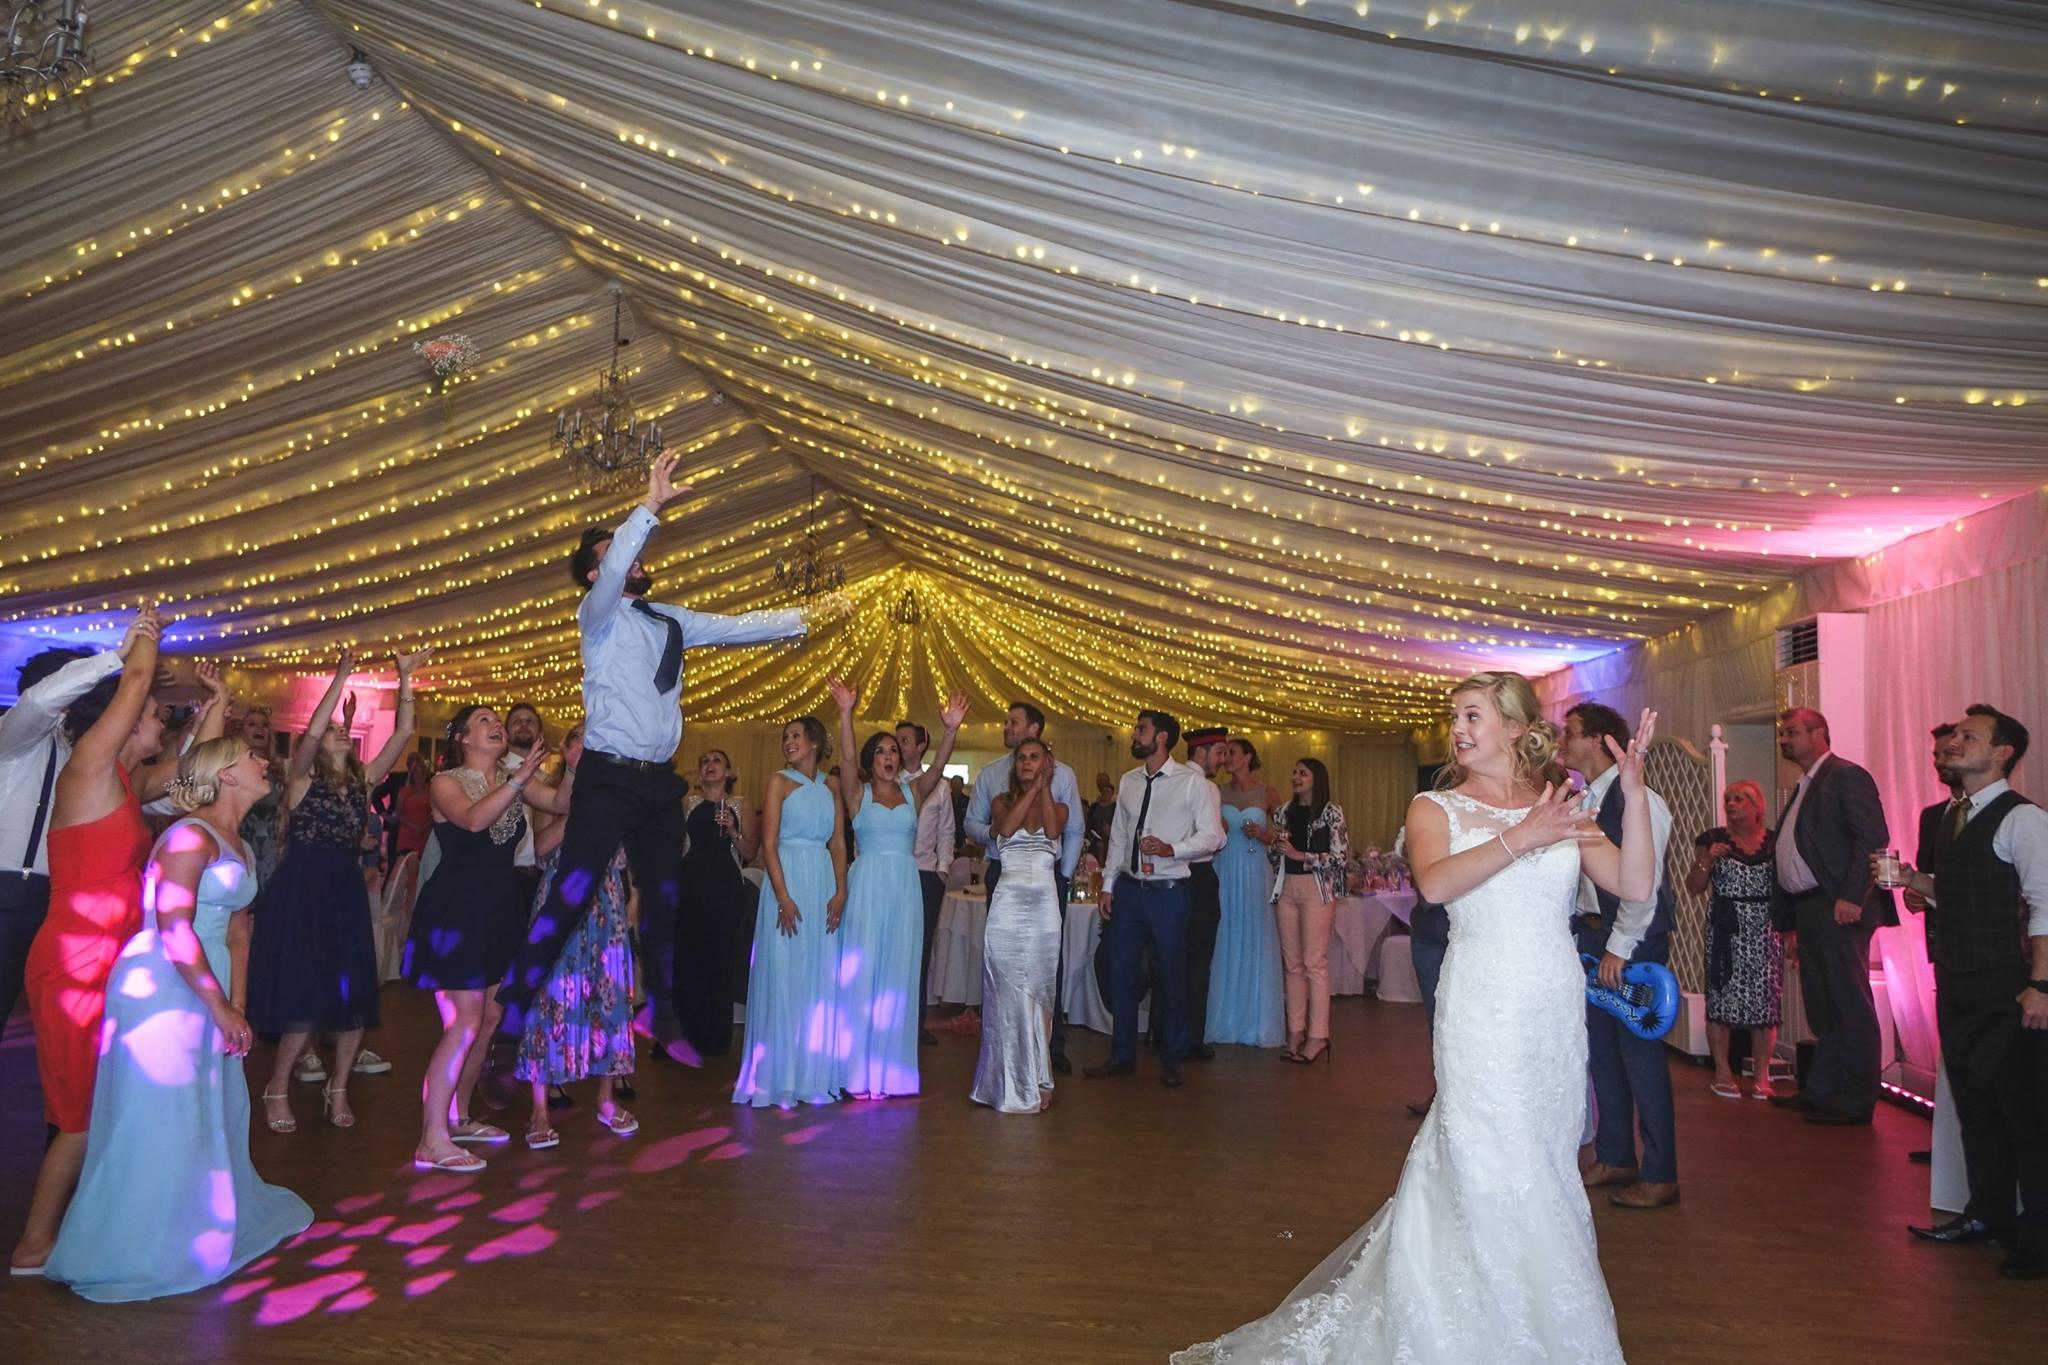 bouquet toss hertfordshire wedding djs jn sounds